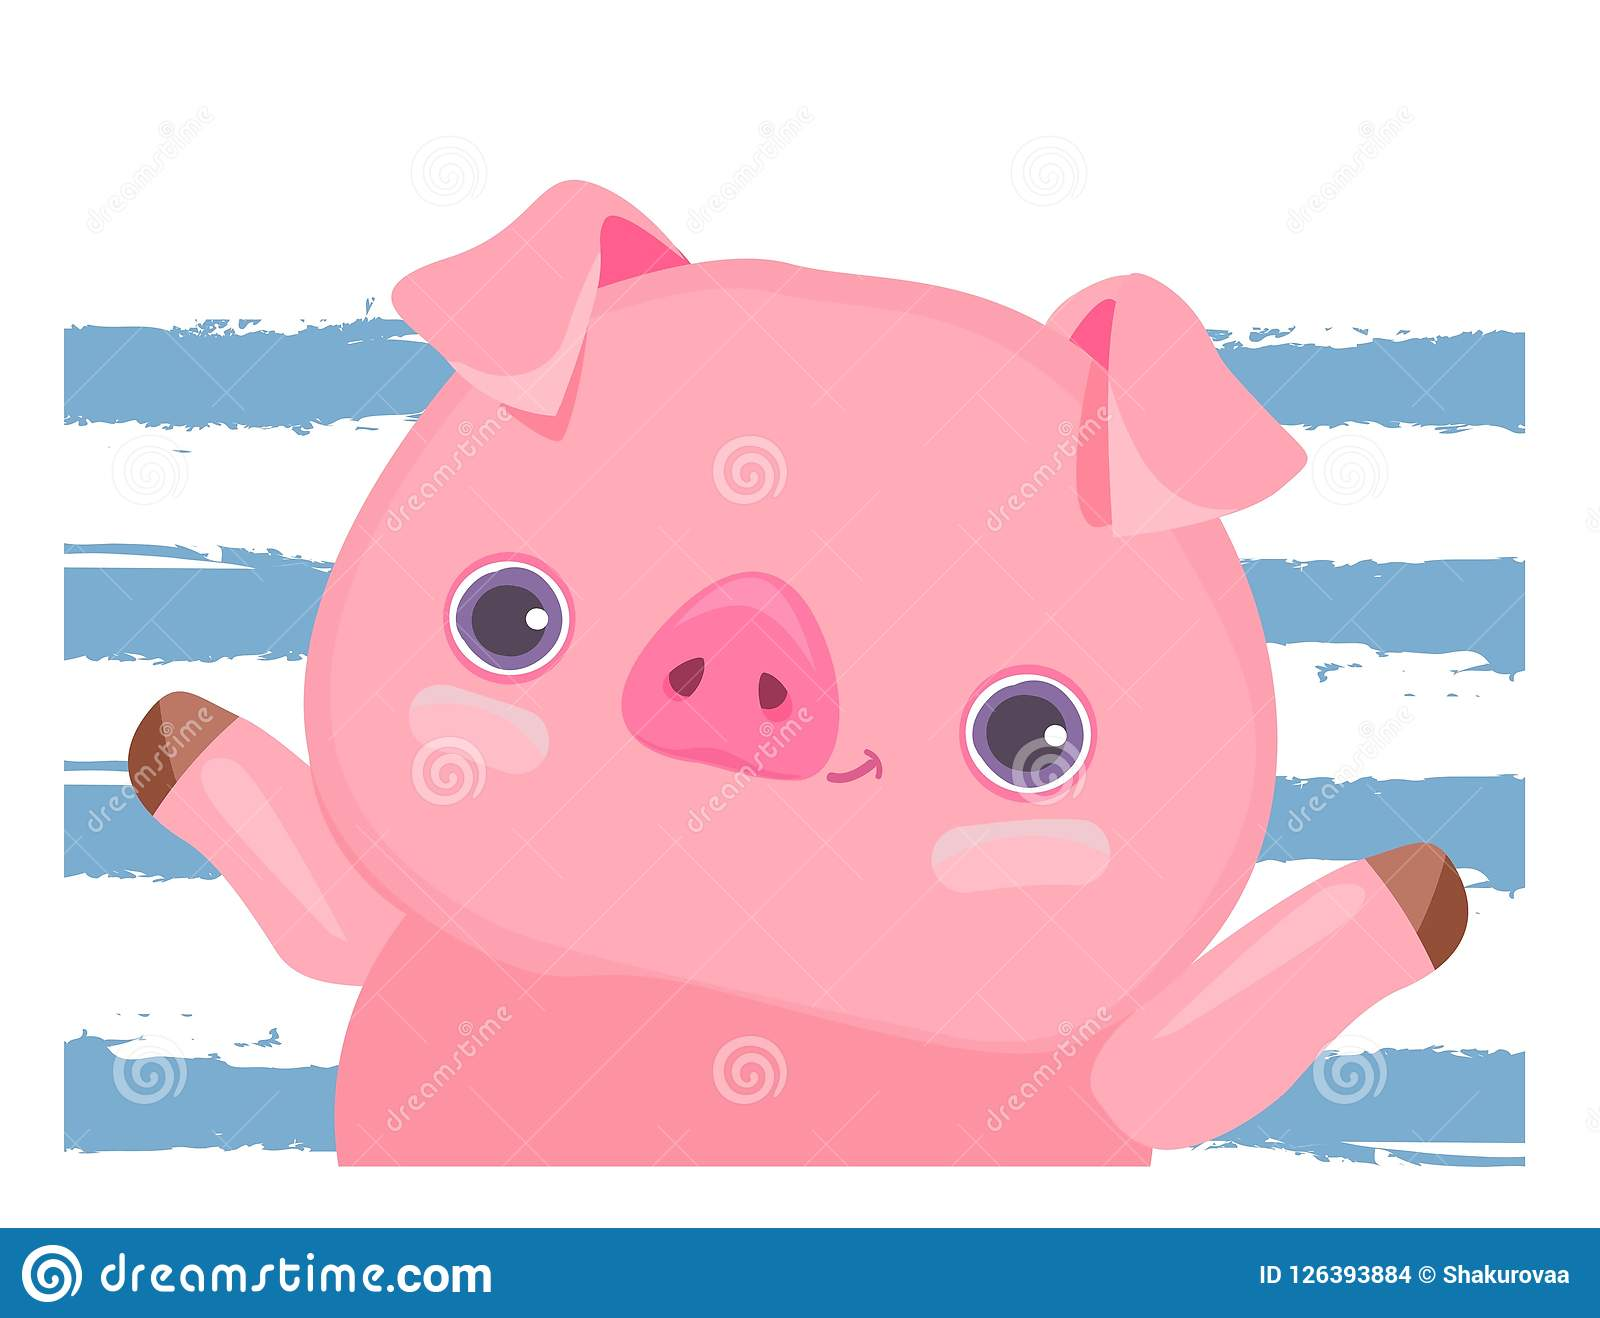 cute pig vector illustration cartoon chinese new year